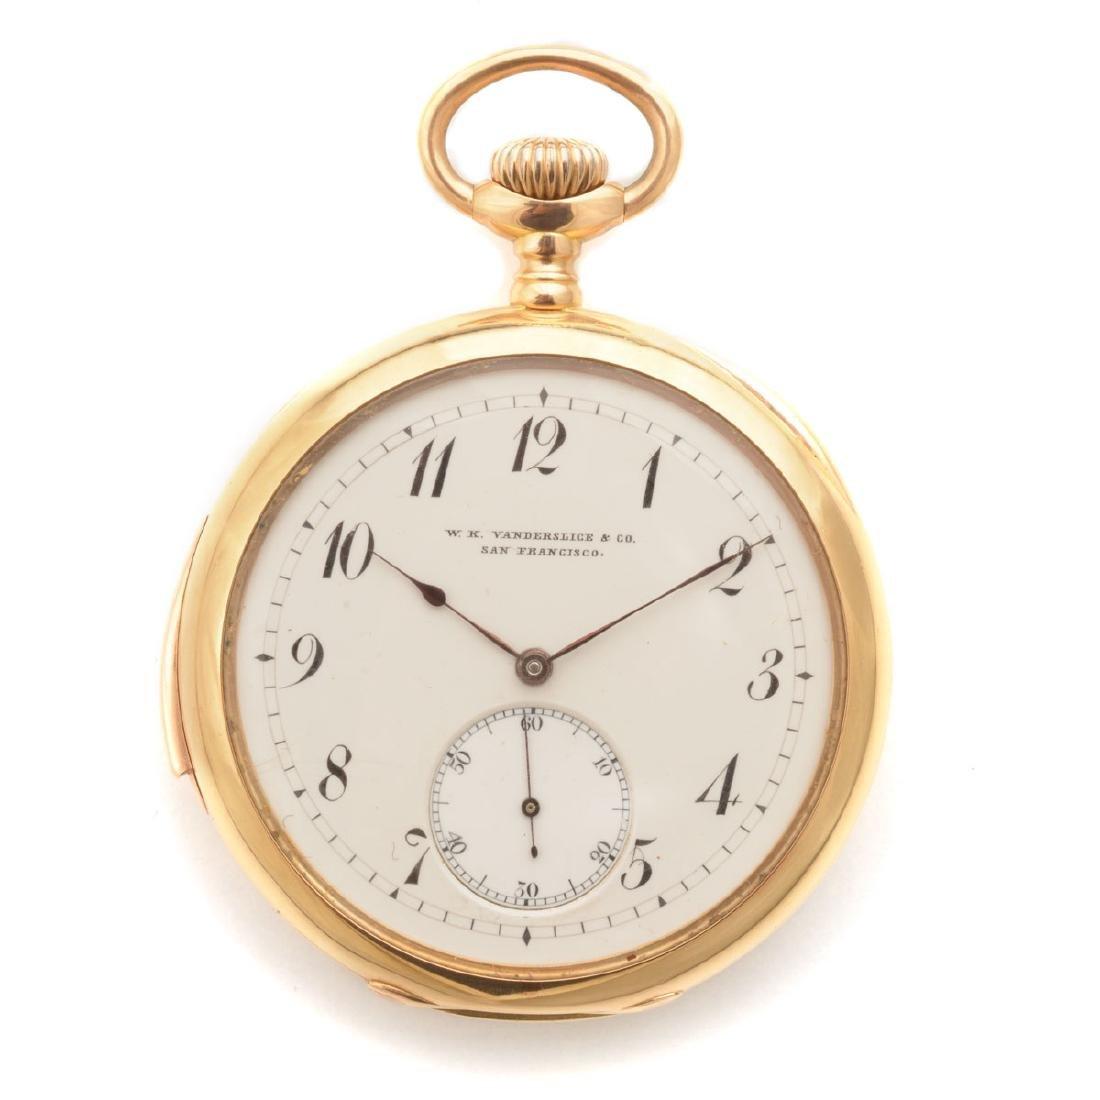 W.K. Vanderslice & Co. 18k Yellow Gold Minute Repeater